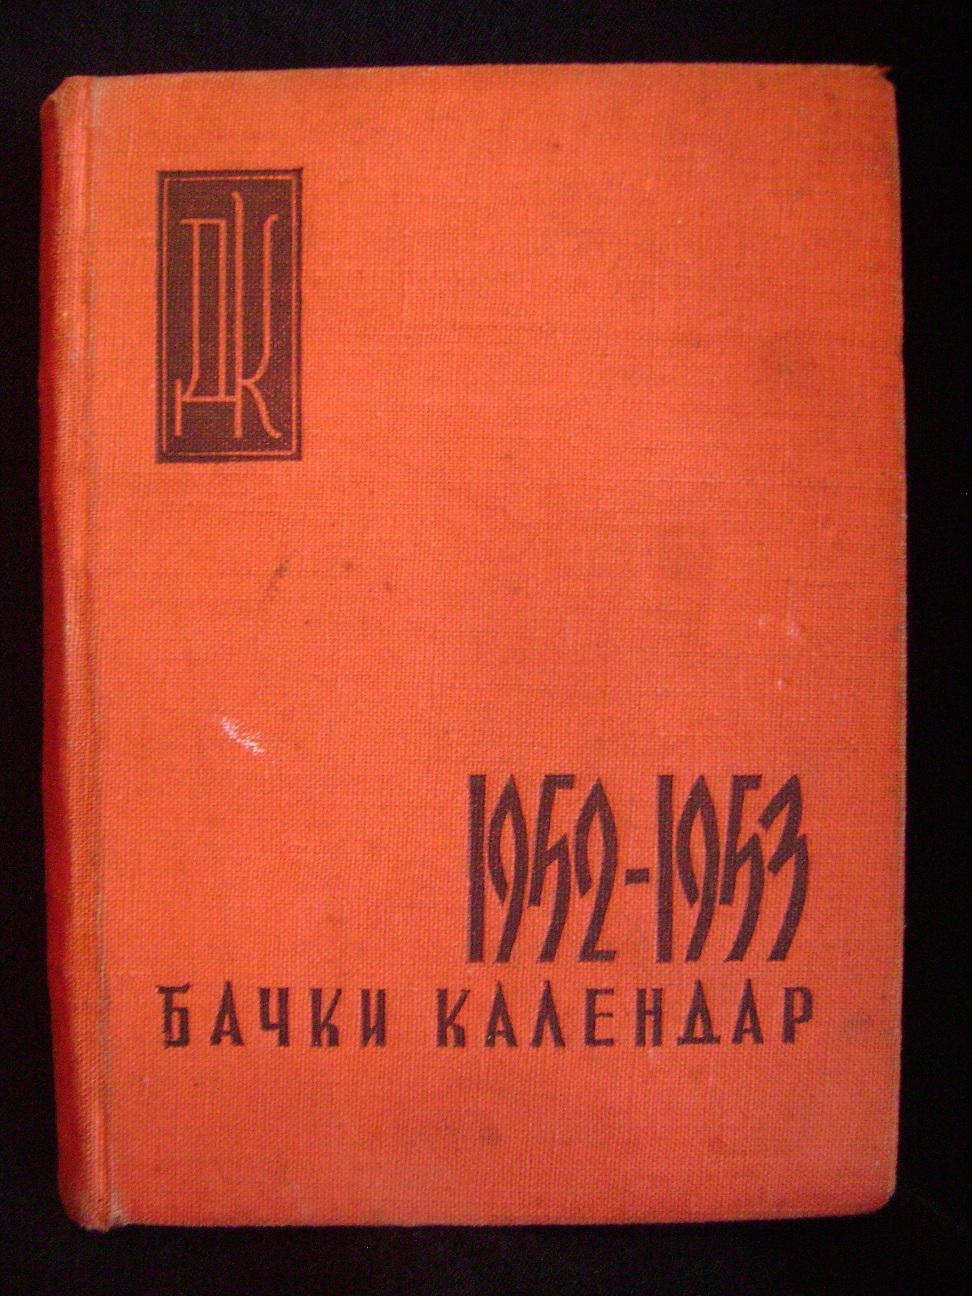 Đački_kalendar_1952-1953_1.JPG